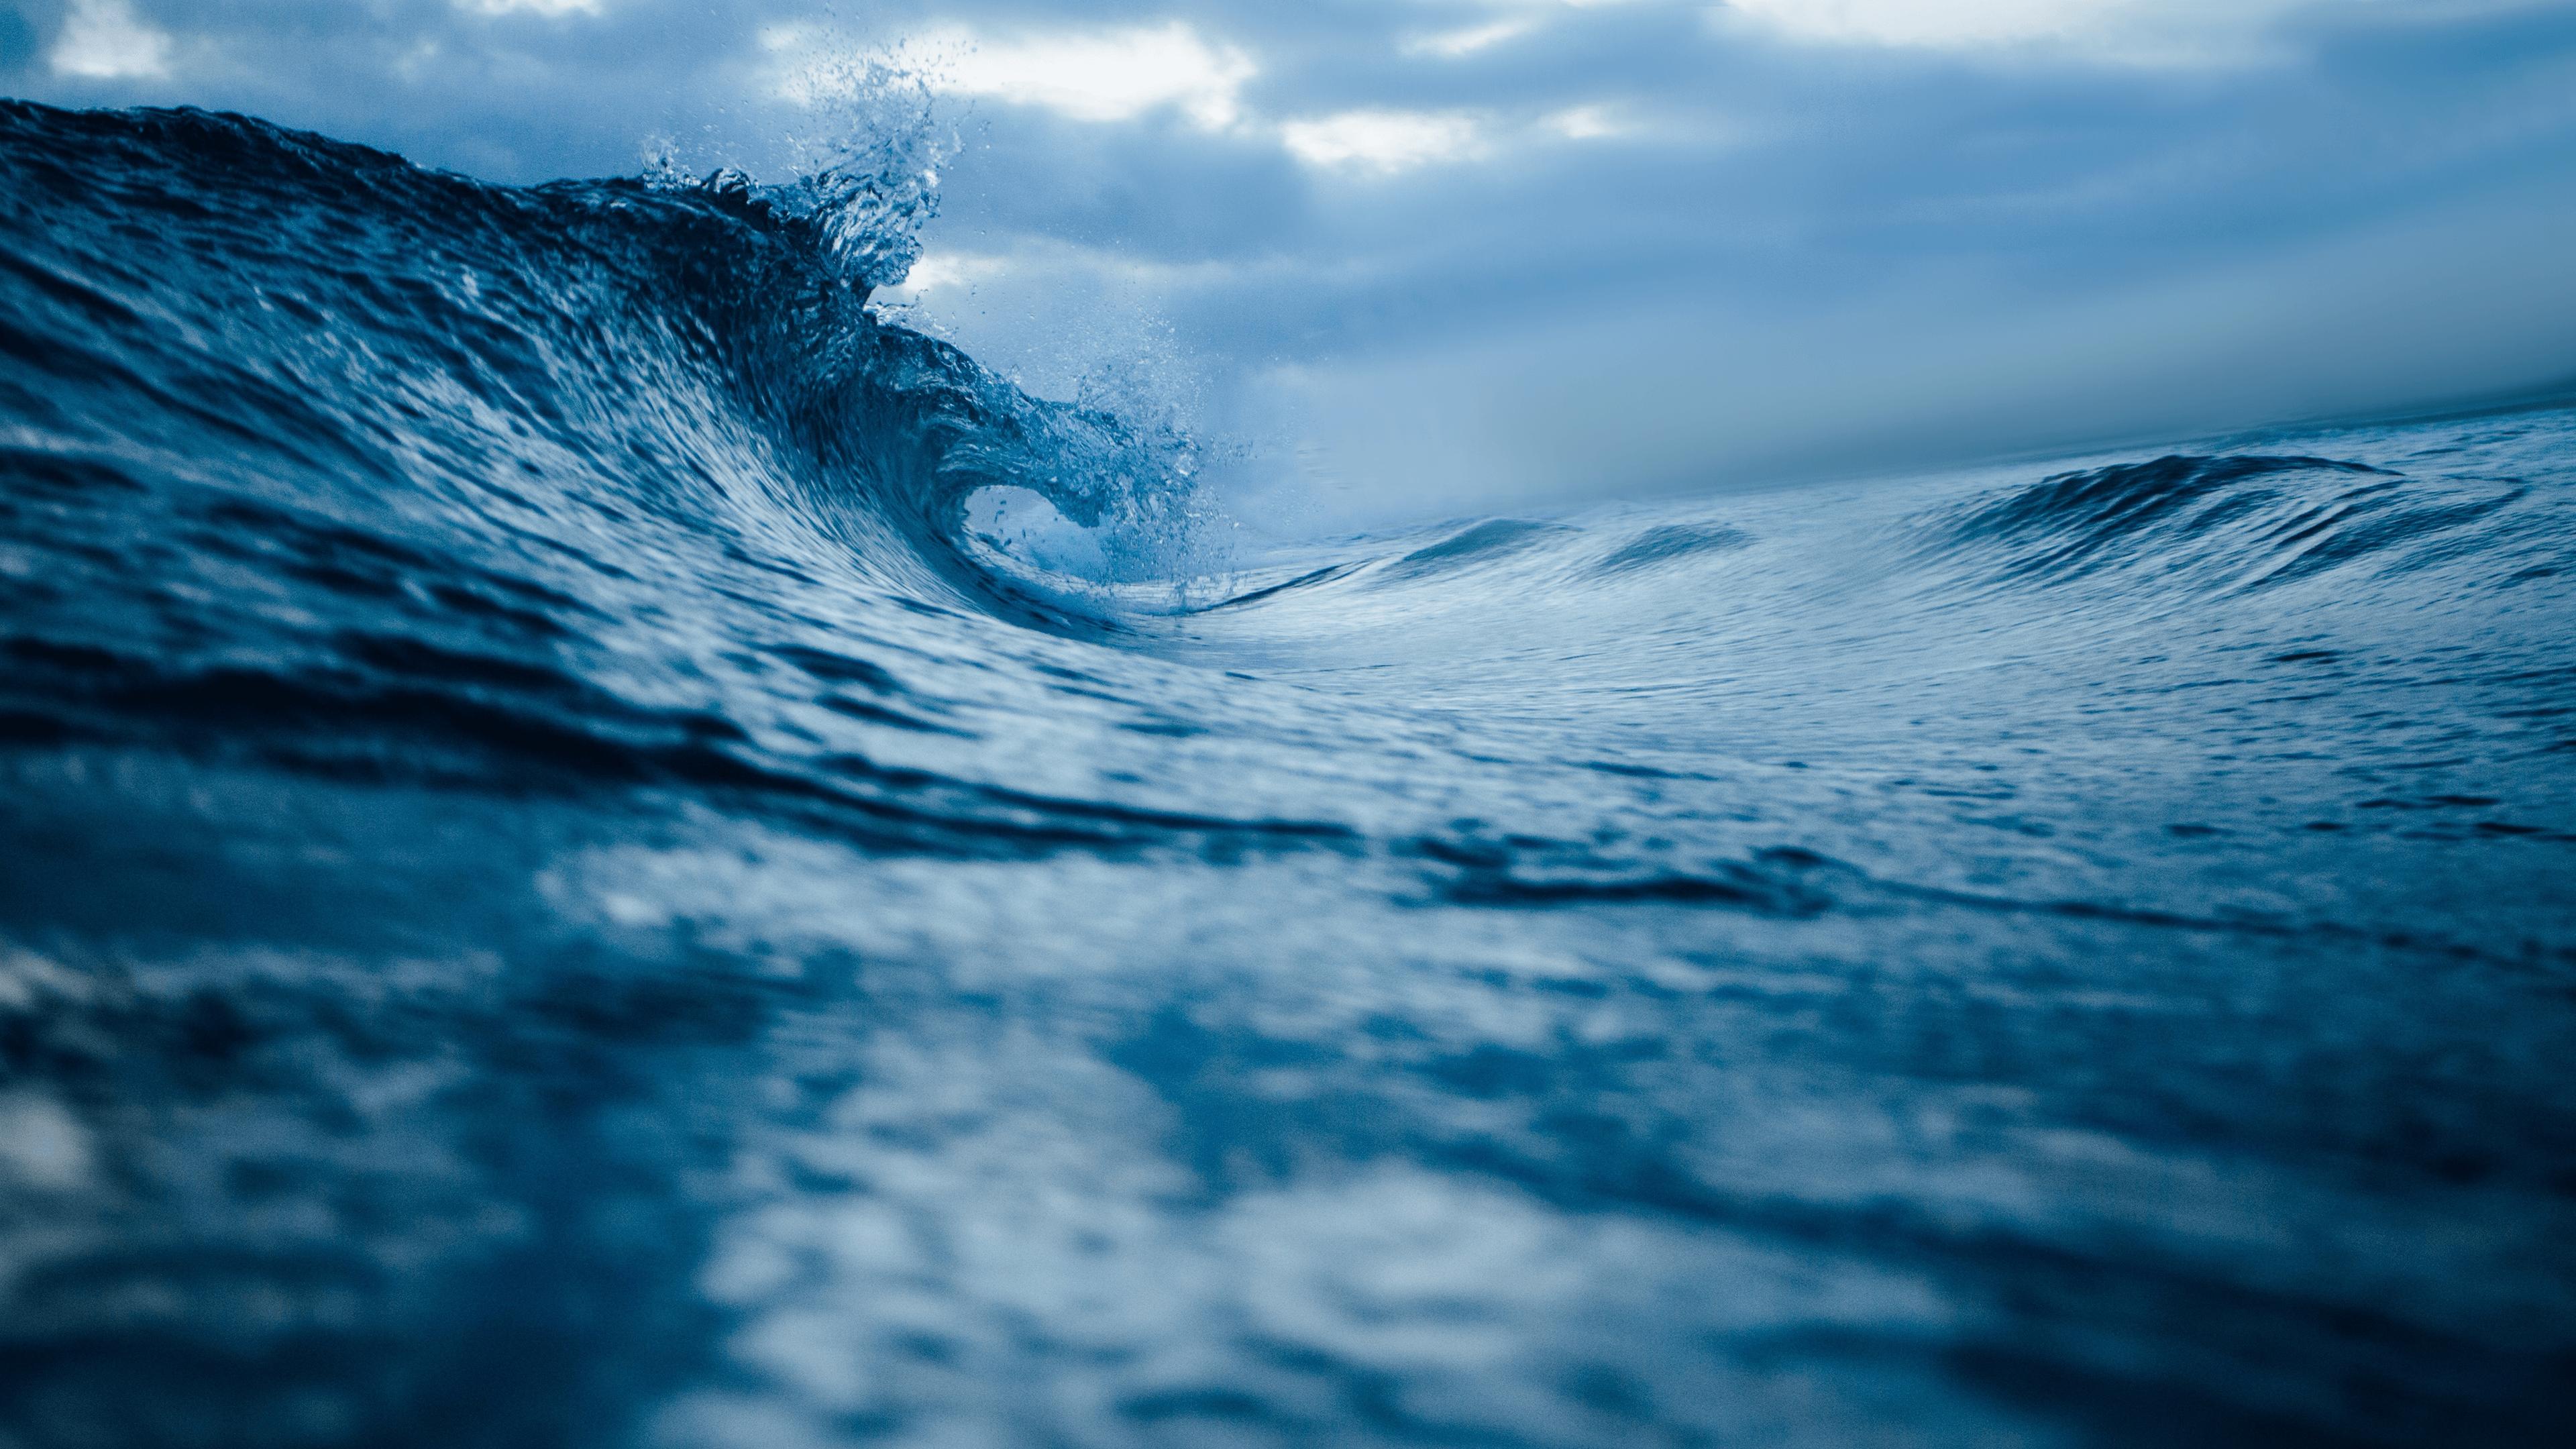 4K Ultra HD Ocean Wallpapers Top Free 4K Ultra HD Ocean